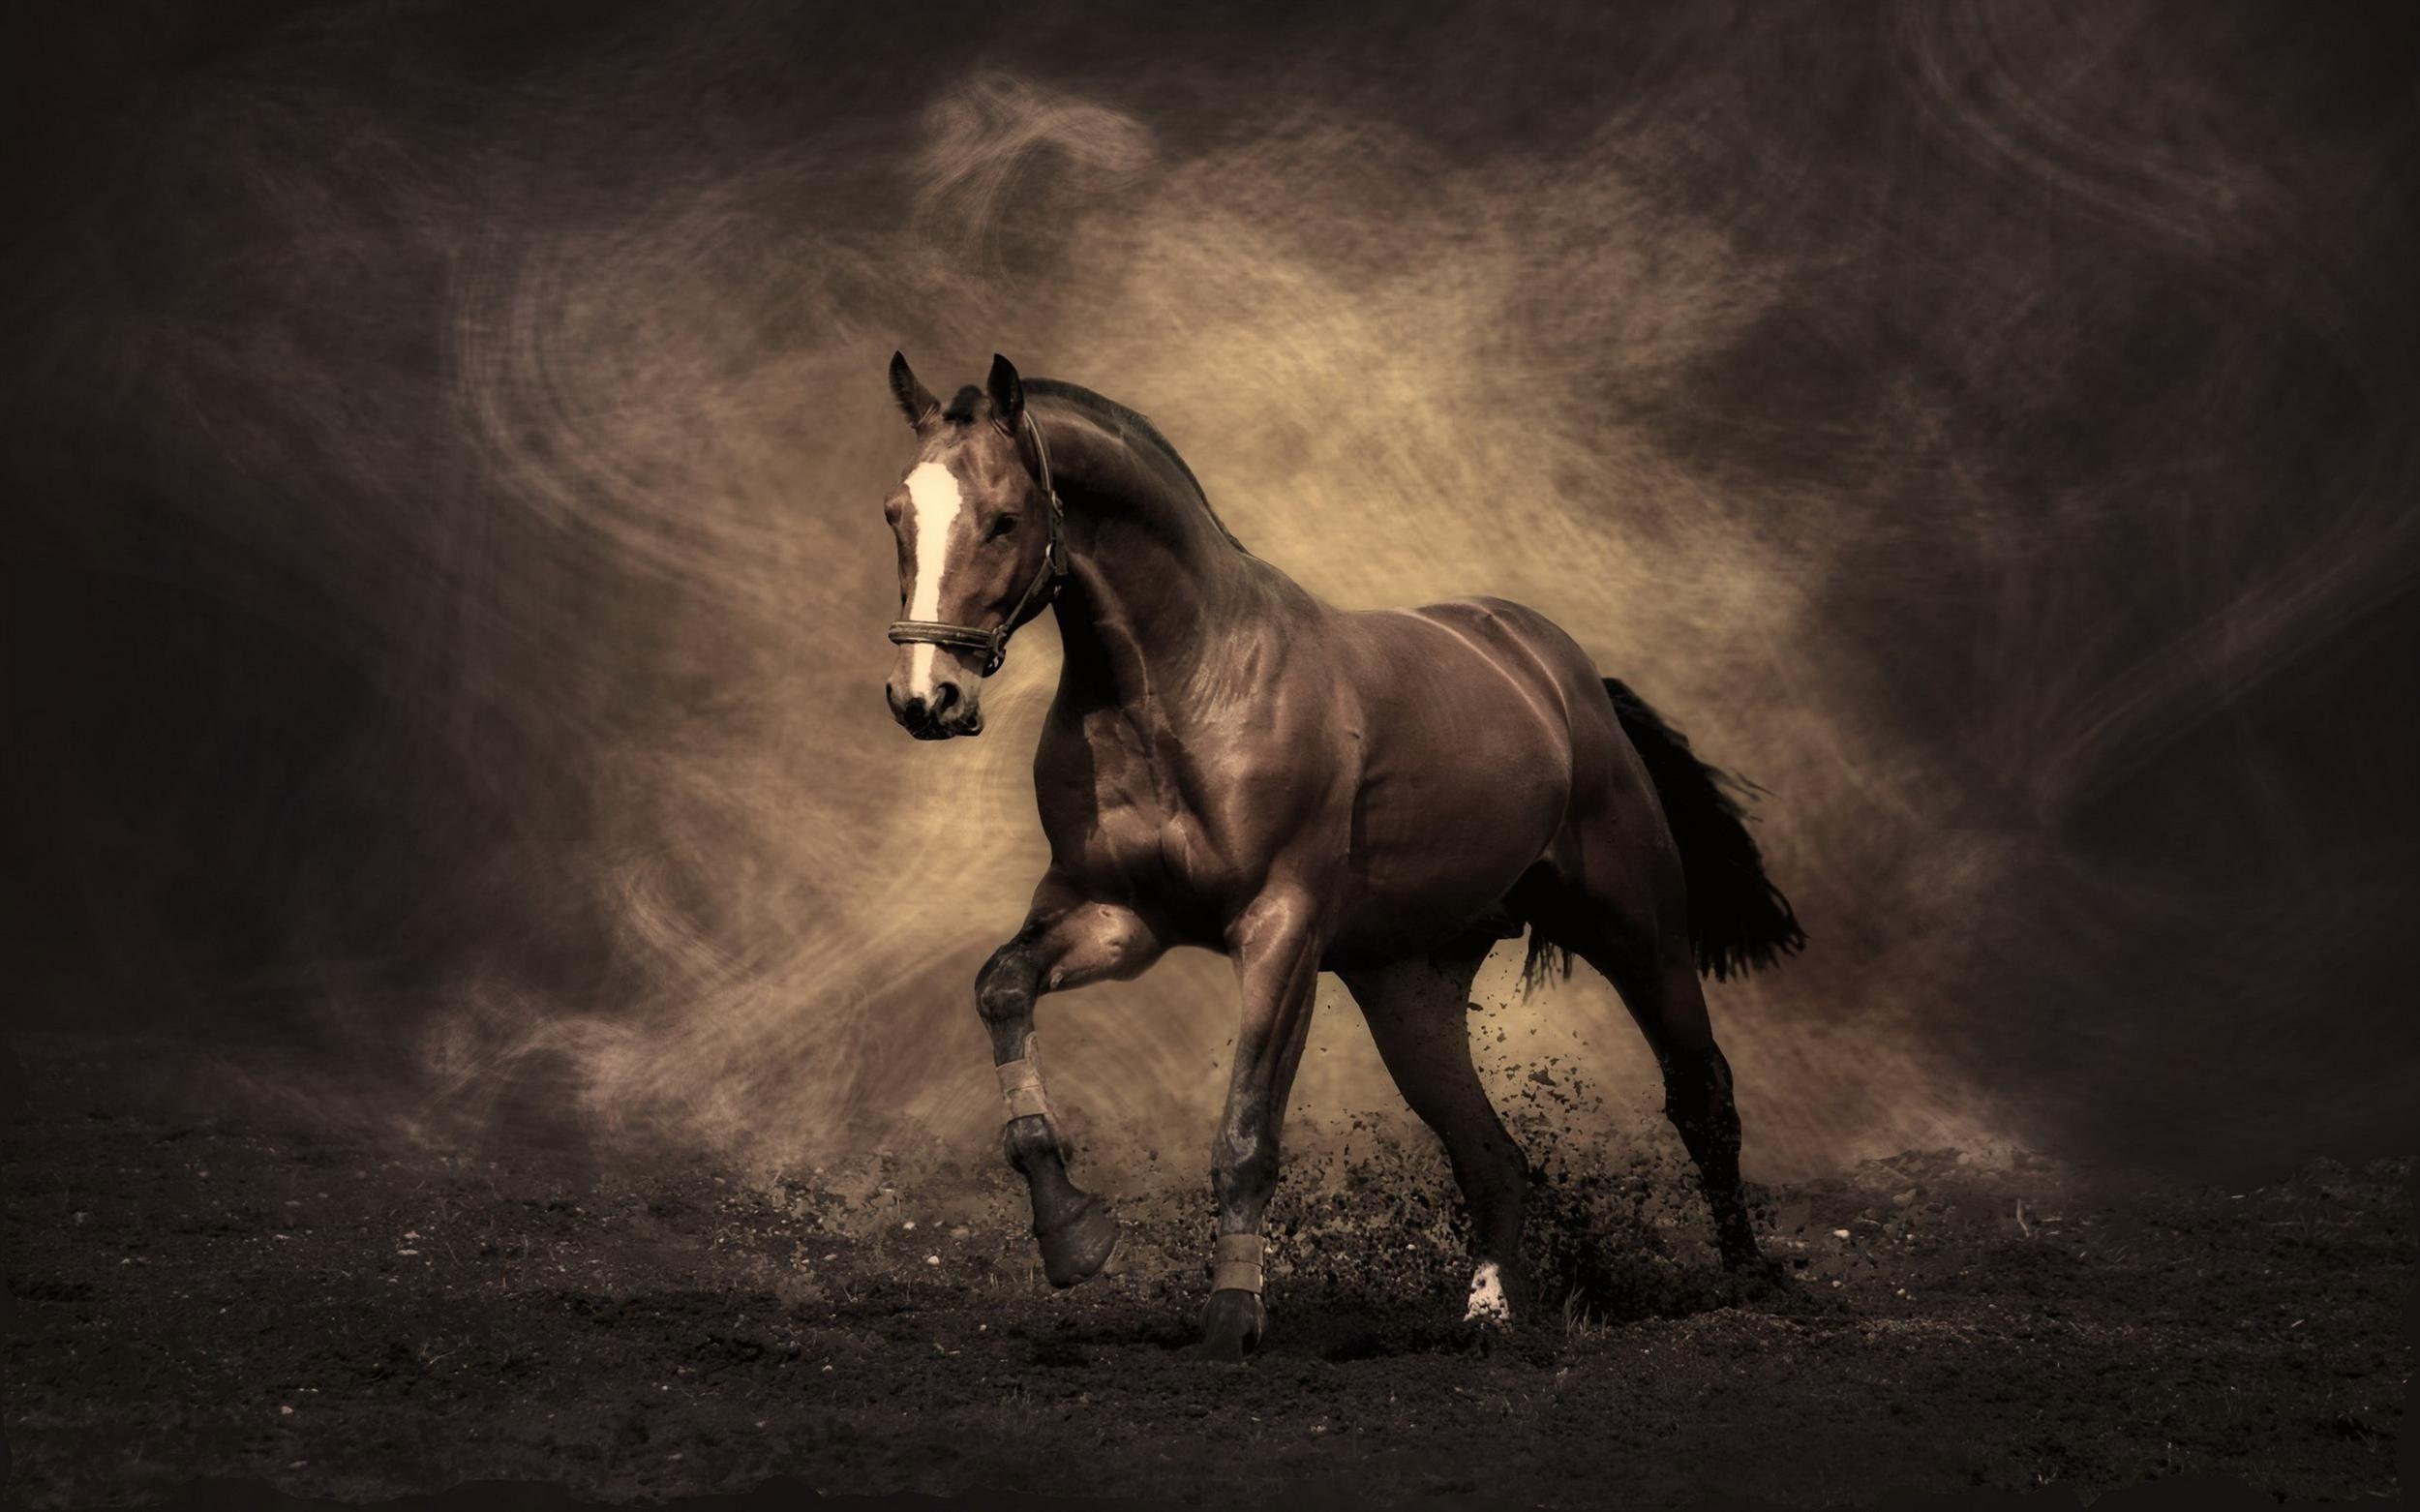 Beautiful Wallpaper Horse Iphone 5s - 22a3c0b2cf0bd8b82f3b1a4db2e1d6b1  Perfect Image Reference_602640.jpg